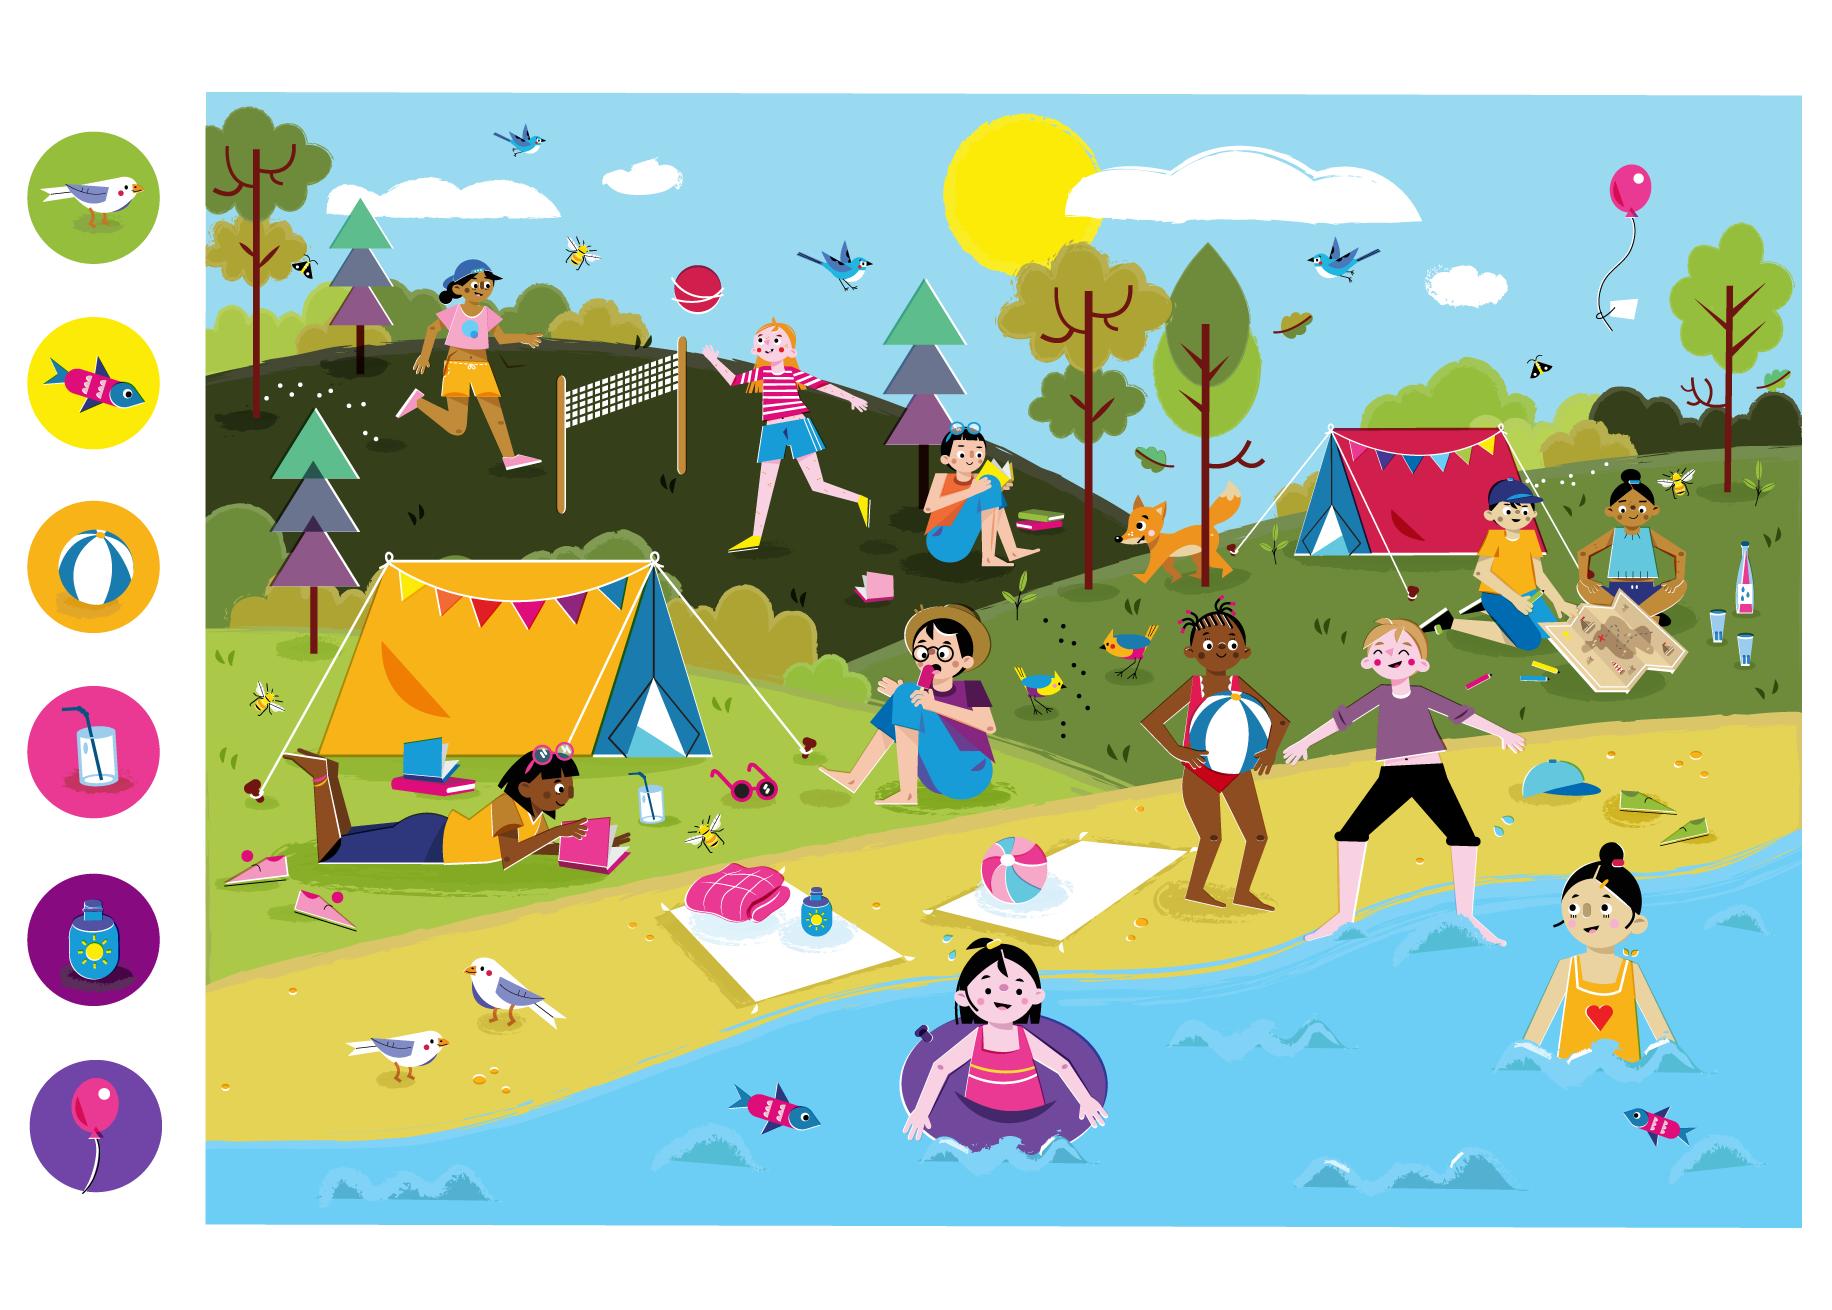 Summer time! - Vector Illustration © Emeline Barrea, All rights reserved